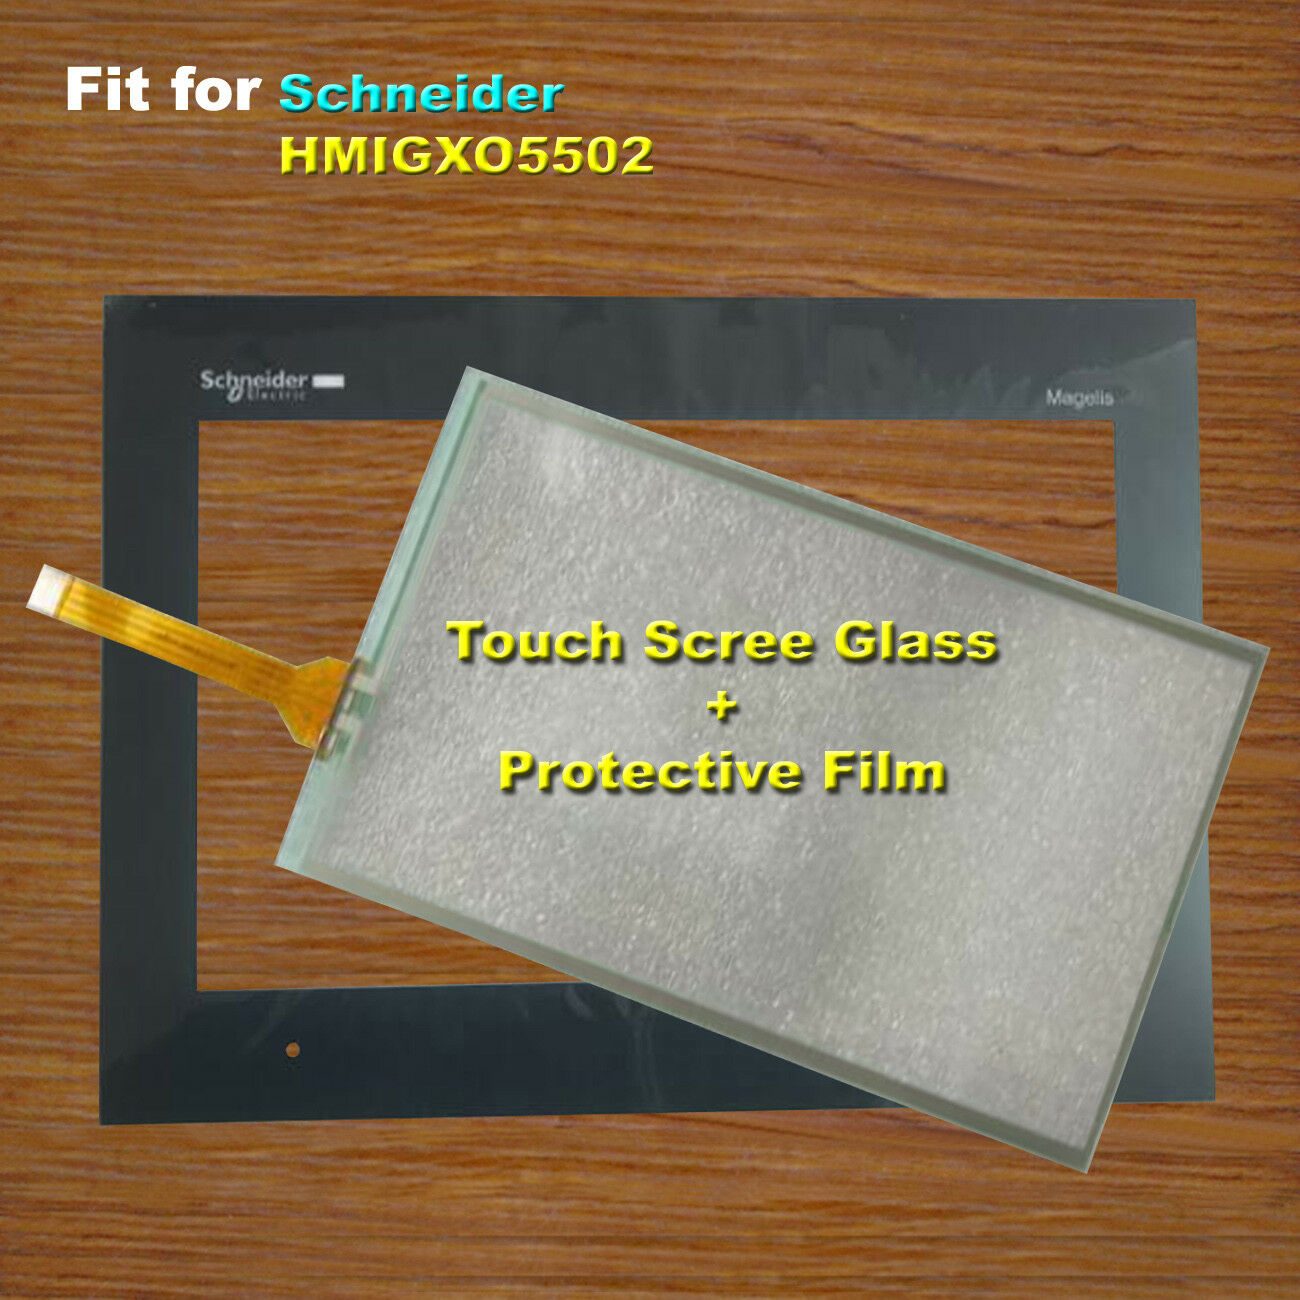 For Schneider HMIGXO5502 Touch Screen Glass + Predective Film 1 Year Warranty